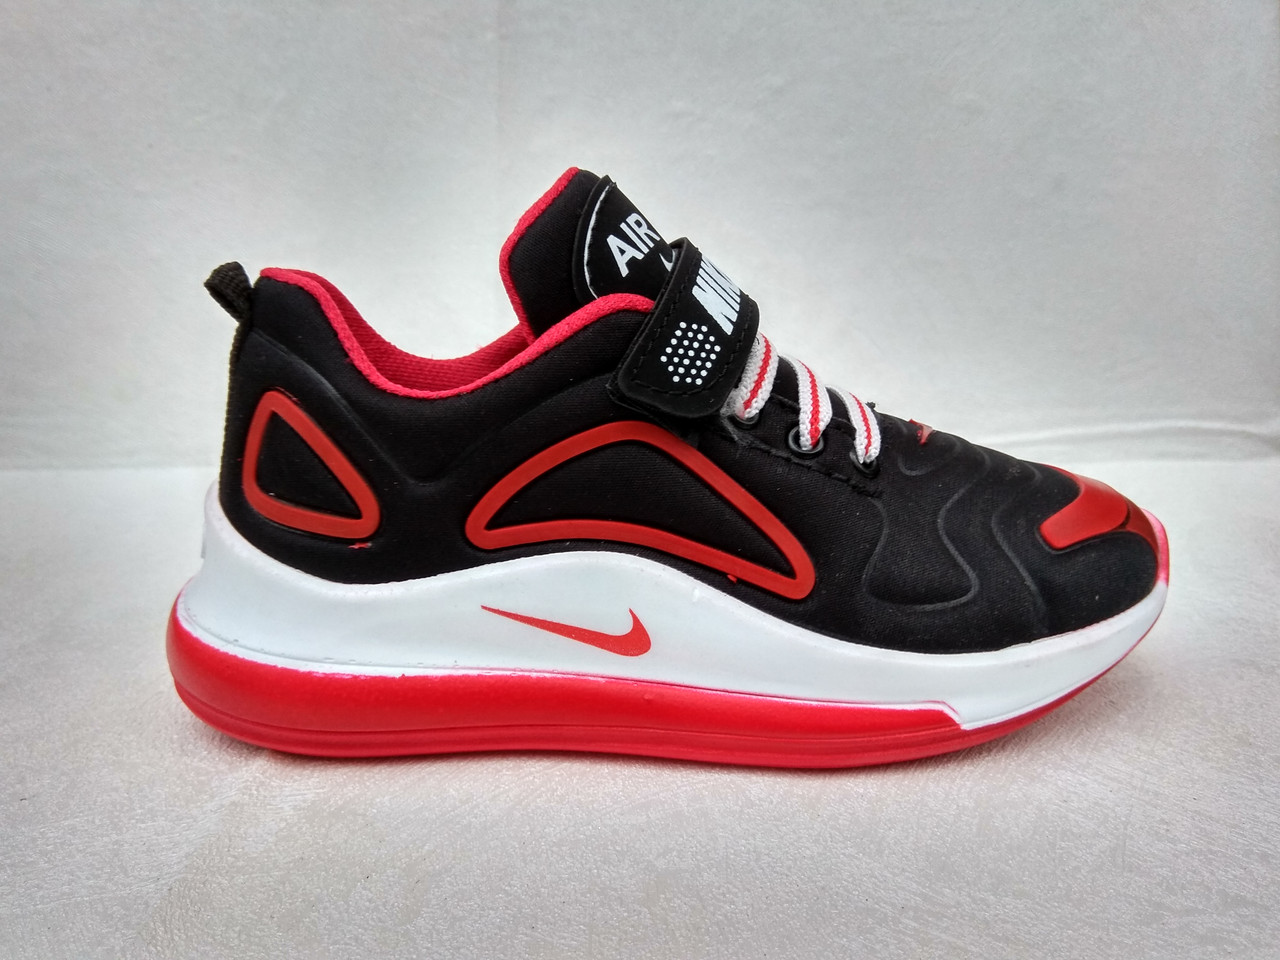 04a5ddea1 Детские кроссовки Nike оптом N720 black/red (р.31-35) Турция реплика ...